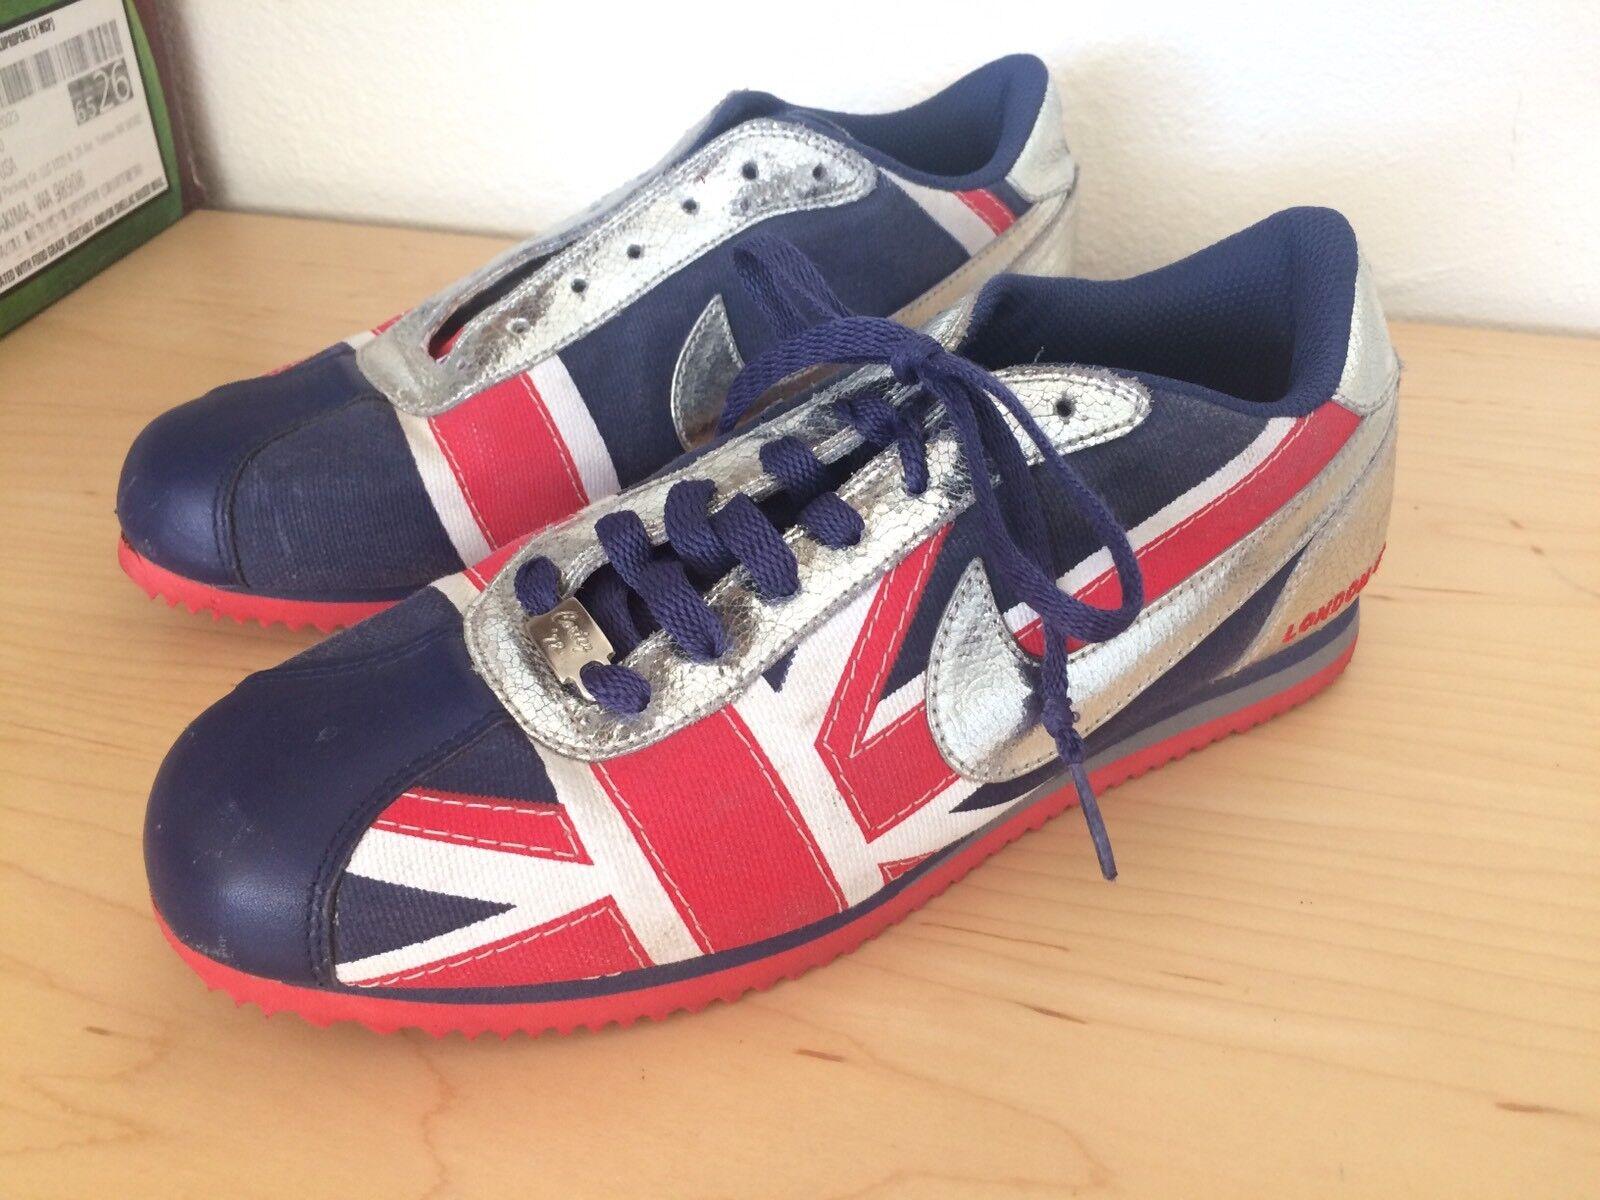 nike cortez '72 id britischen flagge london 07 id '72 8,5 76ec87